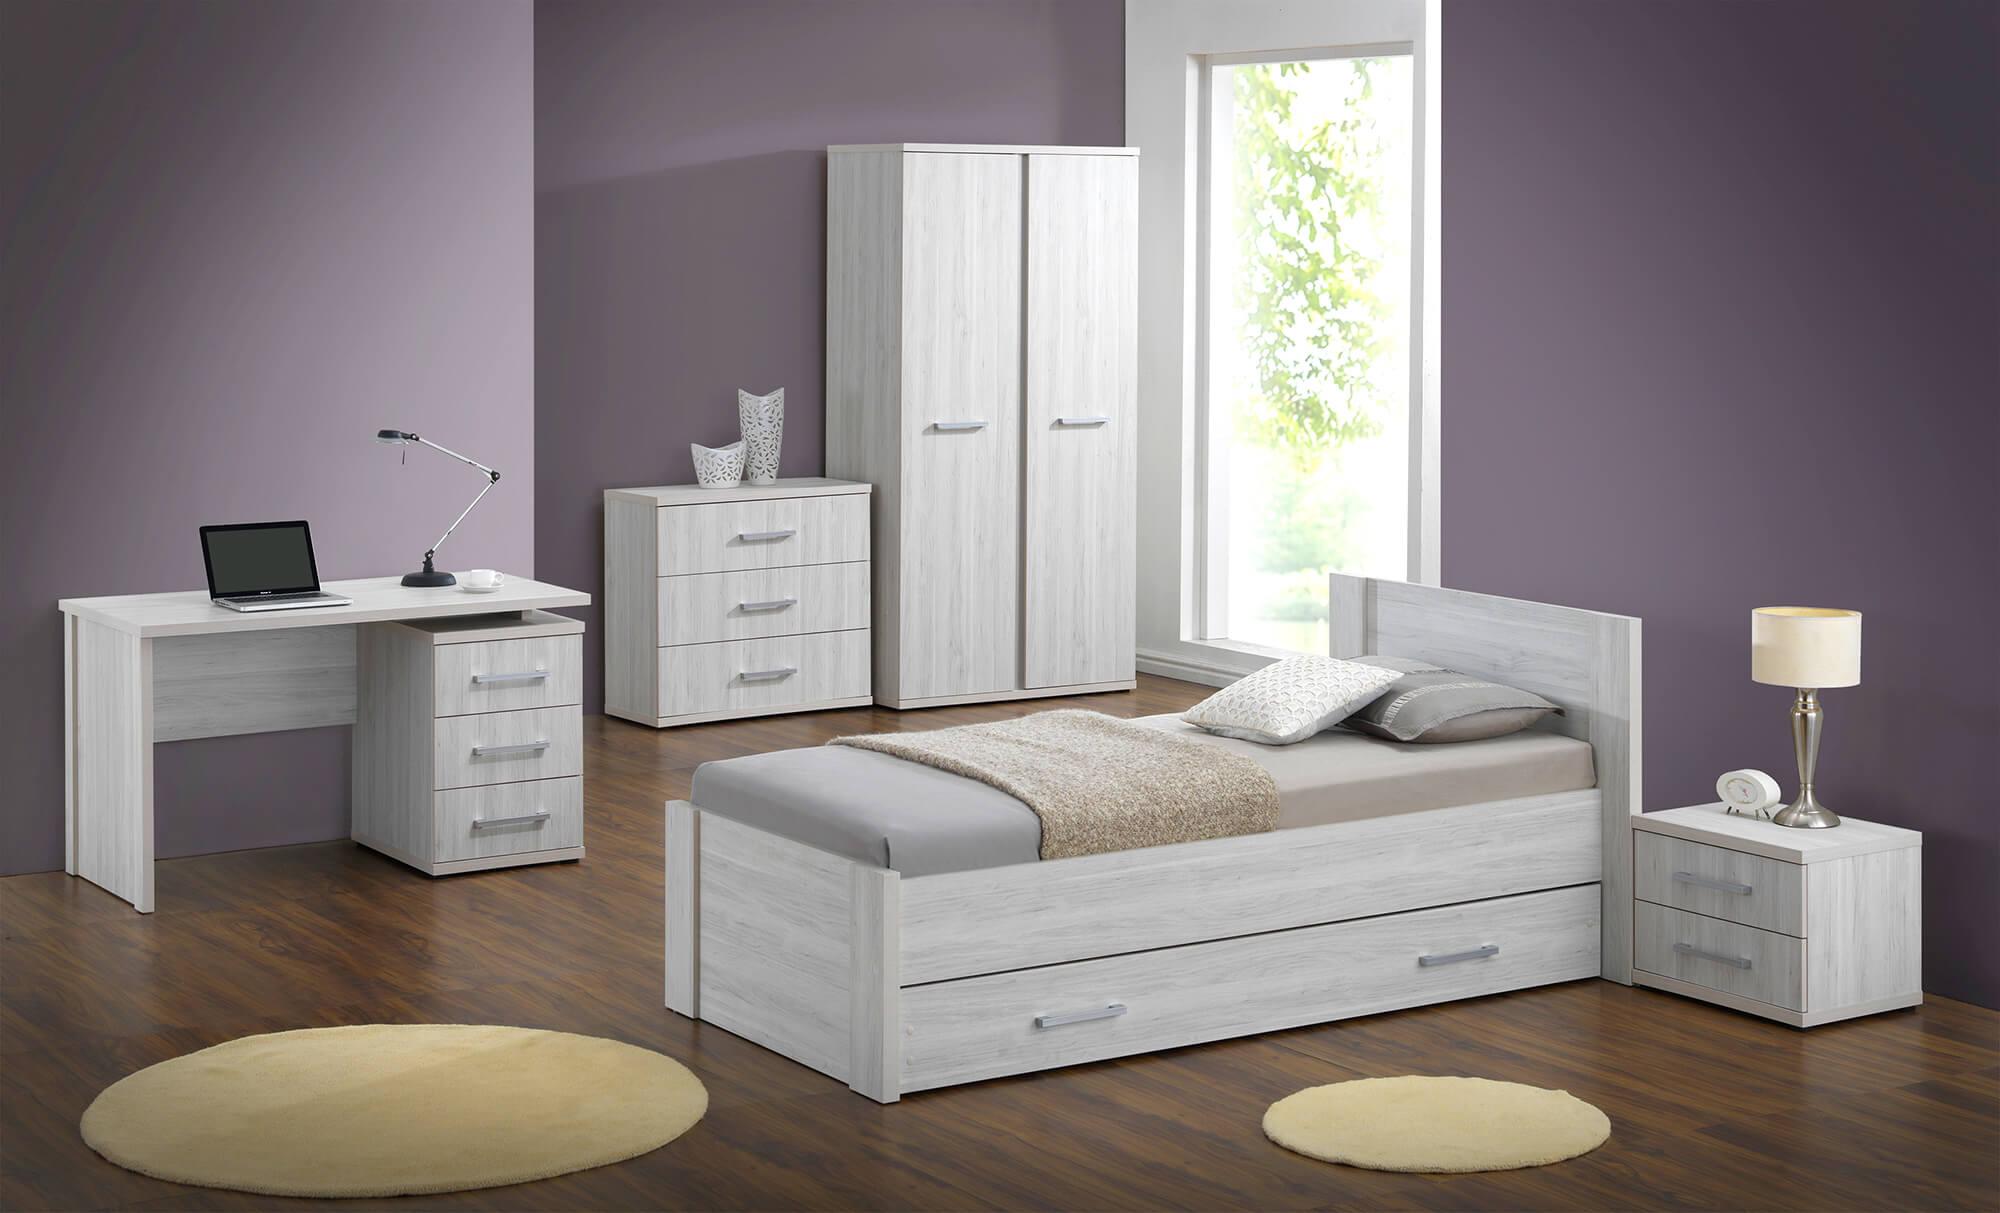 Jeugdslaapkamer Erika, bed 90x200 + nachttafel + kledingkast 105 cm